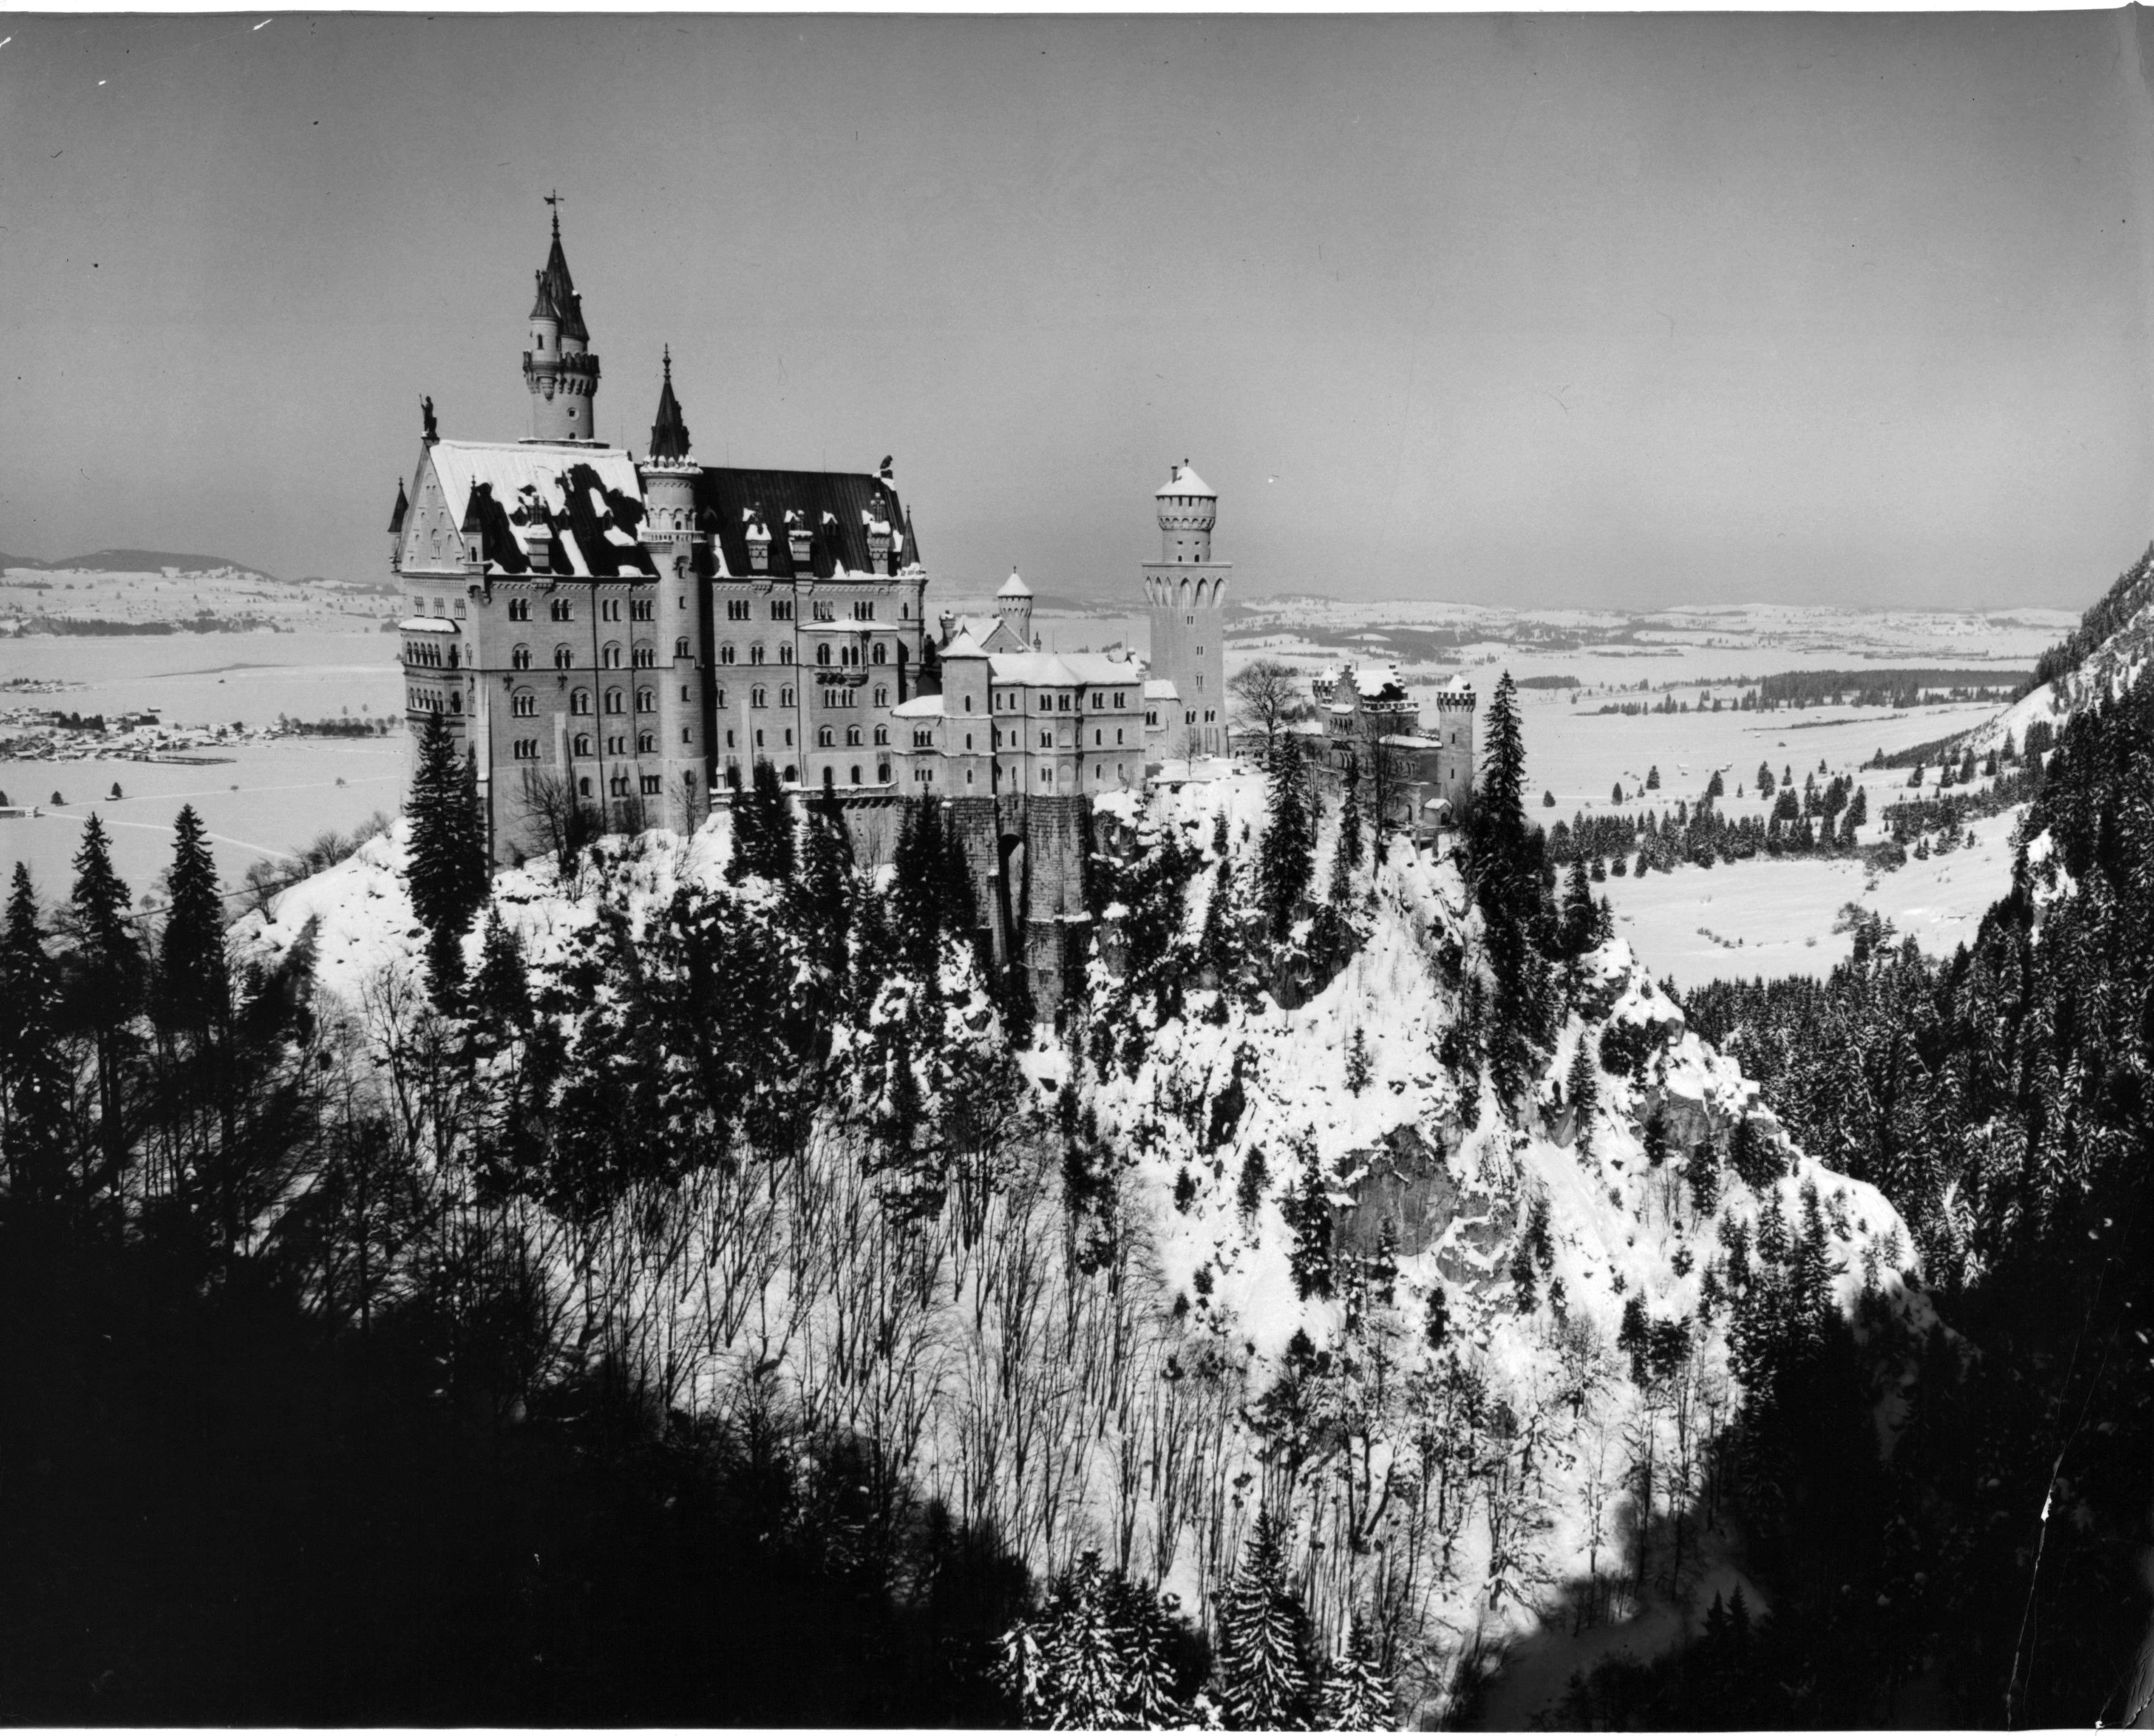 Slide 47 of 55: Neuschwanstein Castle in Germany, 1955. (Photo by Harold M. Lambert/Getty Images)